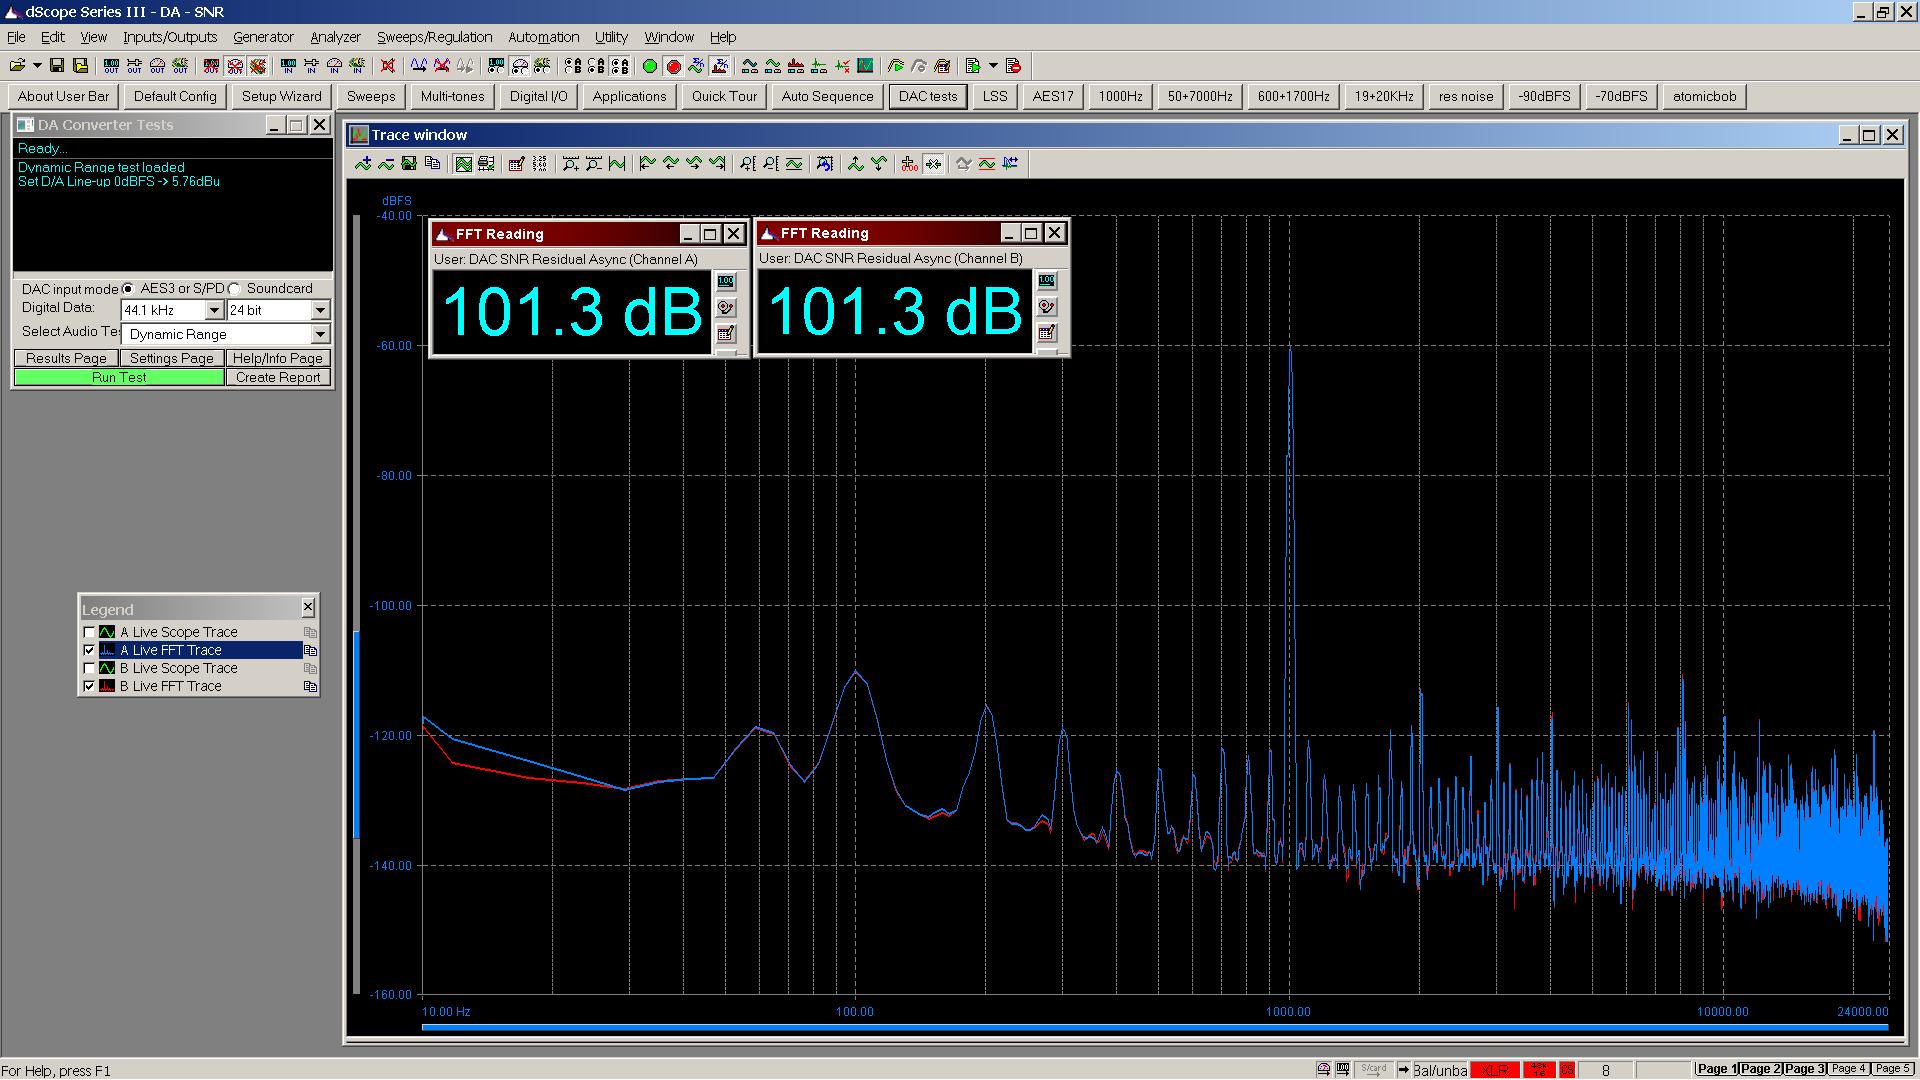 20190429-14 MOS24 SE dynamic range - Opt 44K.PNG